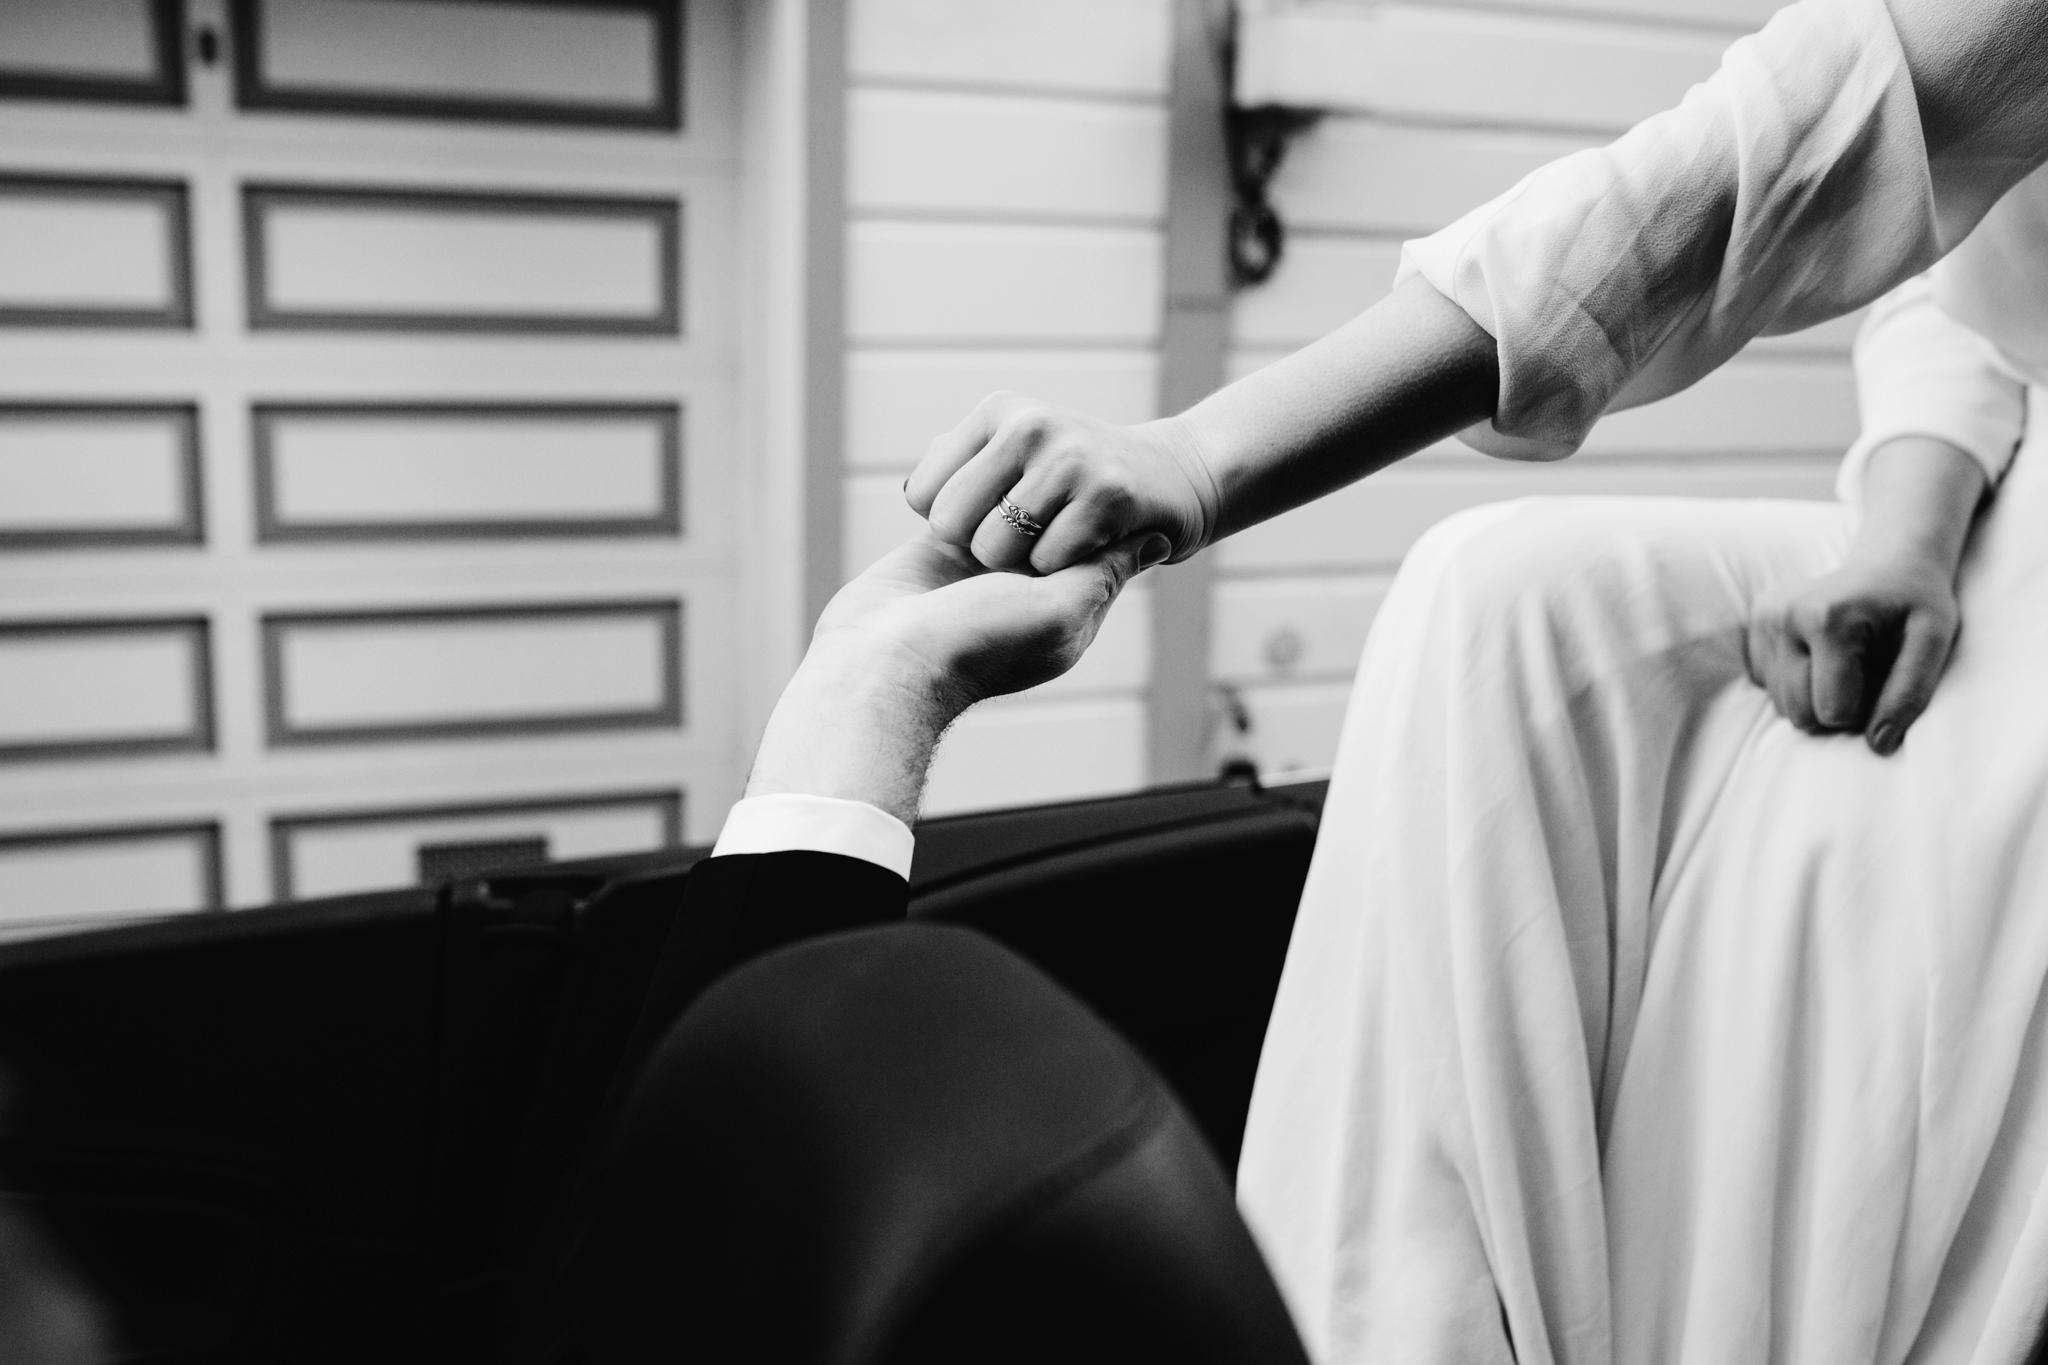 SF City hall elopement, San Francisco city hall elopement photographer, sf elopement photographer, sf intimate wedding, unique sf elopement, unique sf elopement photographer, San Francisco elopement,  sf wedding photographer, east bay wedding photographer, Bay Area wedding photographer, documentary wedding photographer in Bay Area, sf city hall, california elopement photographer, Northern California wedding photographer, Los Angeles wedding photographer, Palm Springs wedding photographer